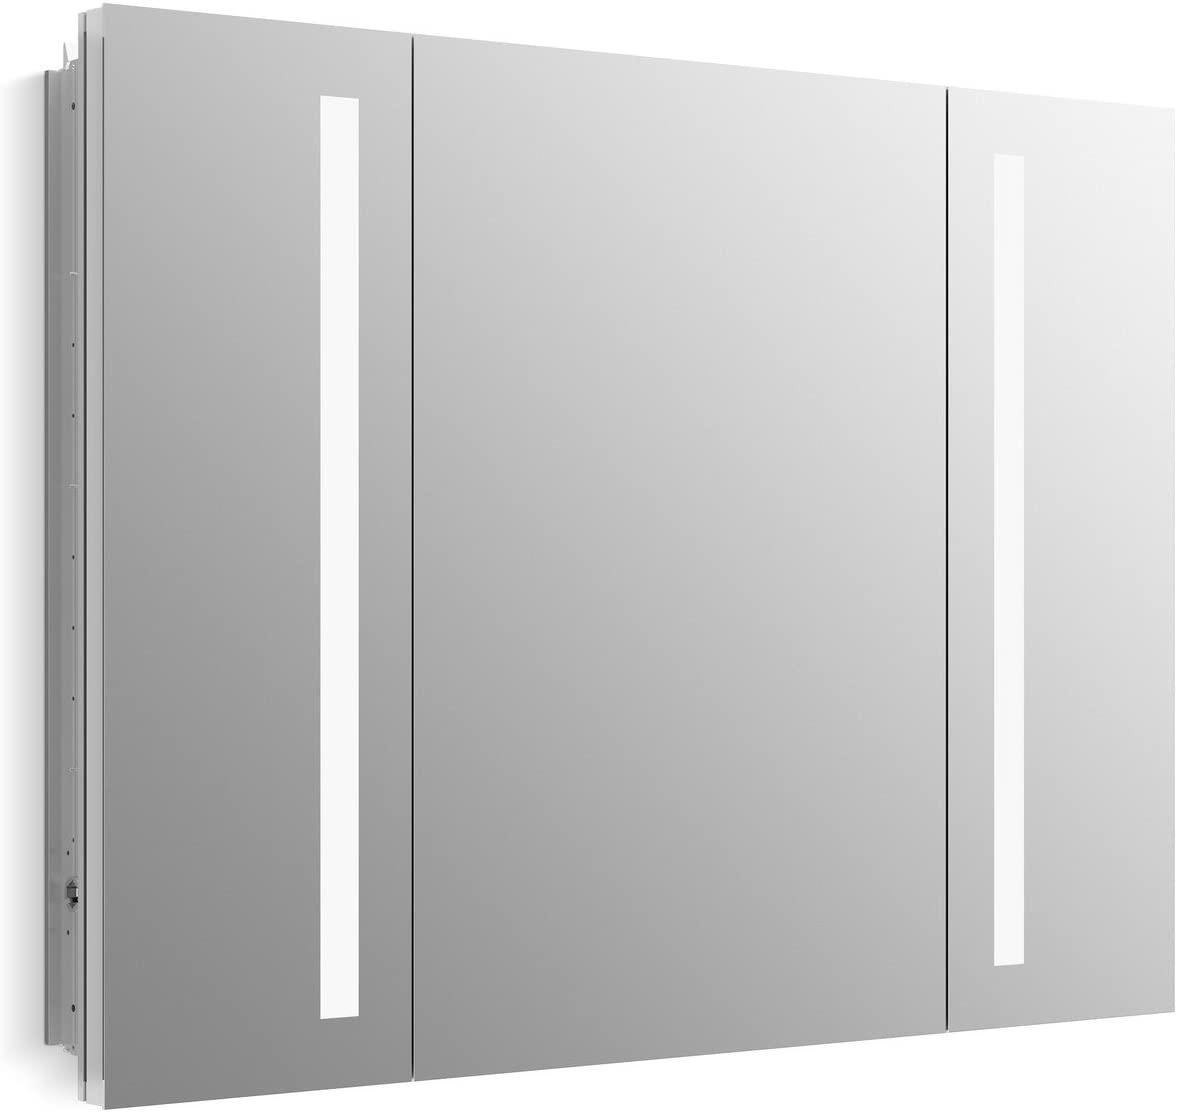 KOHLER K-99011-TL-NA Verdera 40 inch x 30 inch LED Lighted Bathroom Medicine Cabinet, Slow Close Hinge, Internal Magnifying Mirror; Aluminum; Recess or Surface Mount; 3 Doors